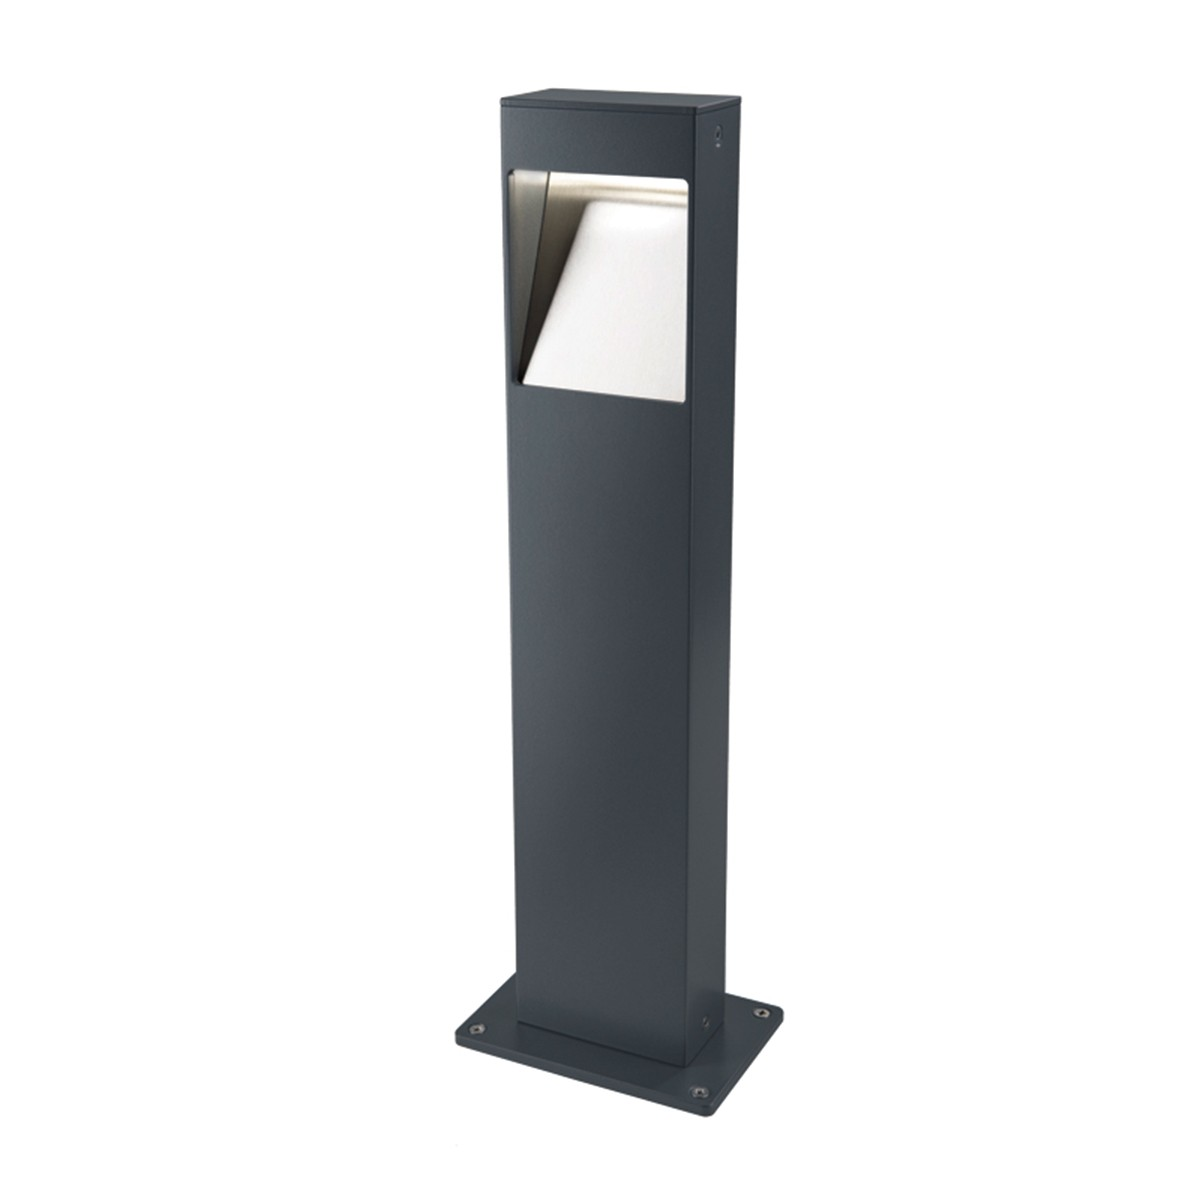 Heibi Strato Wegeleuchte, grau, Höhe: 50 cm